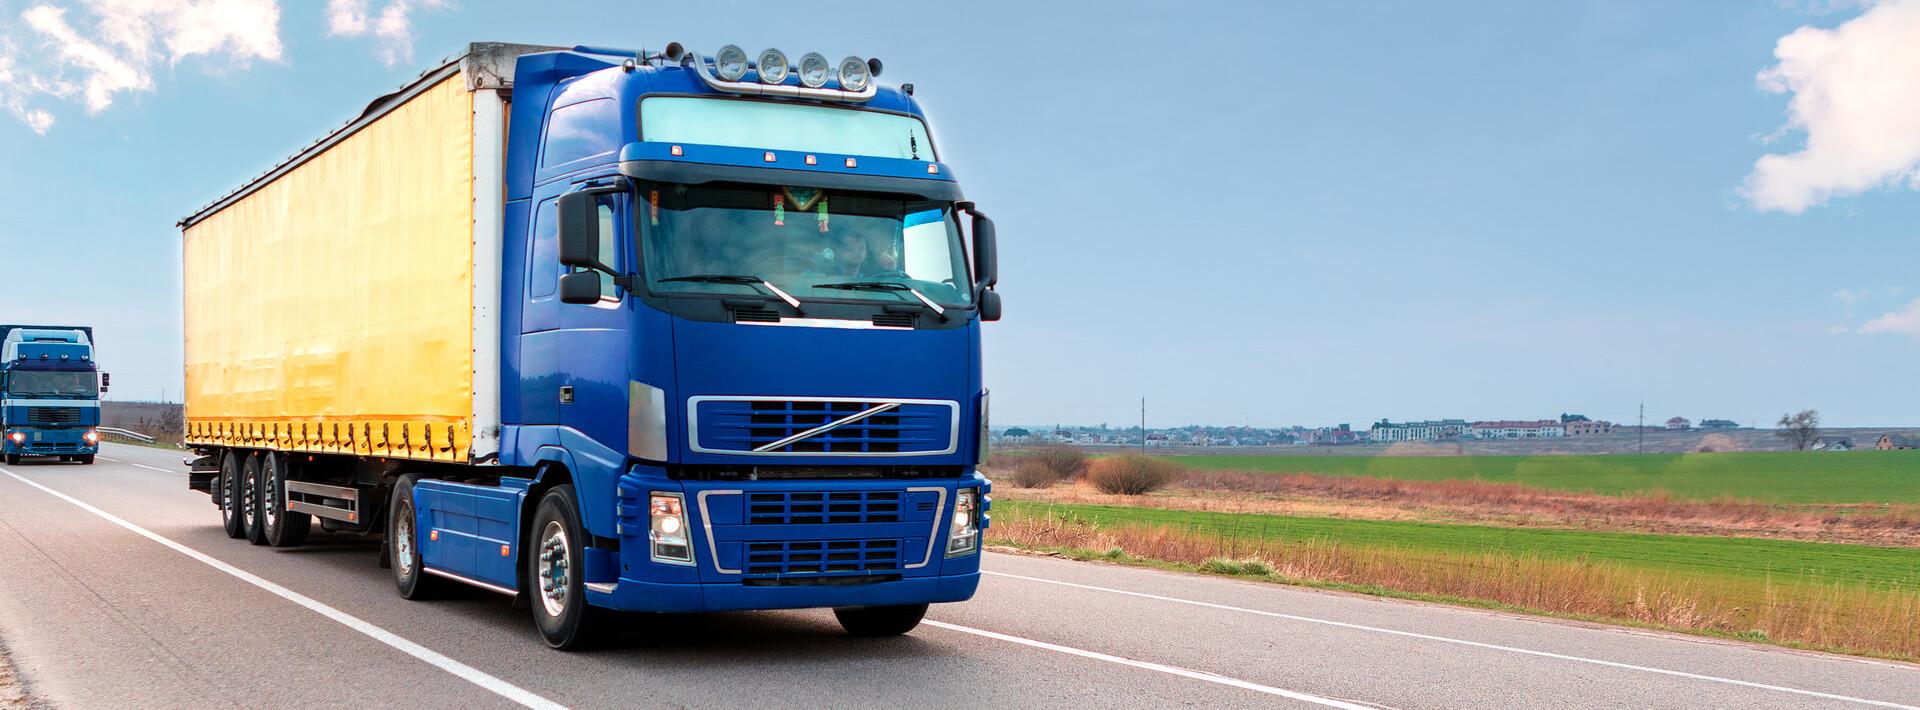 Kamionski transport